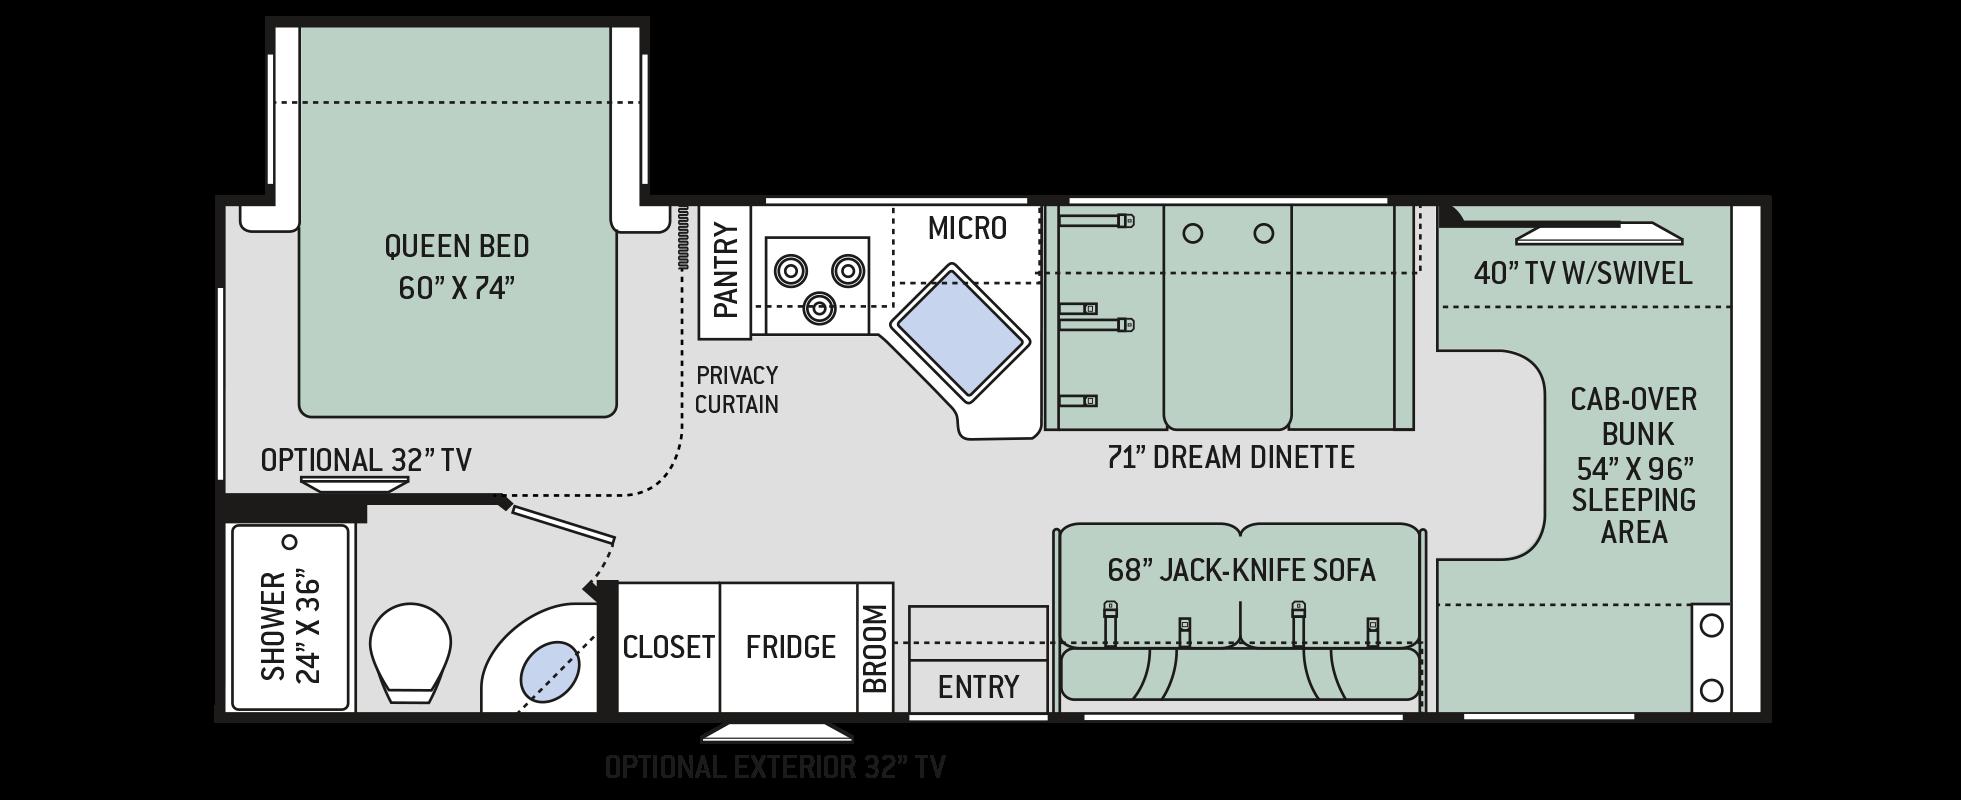 Diagram Ac Motor Home Cab - House Wiring Diagram Symbols •